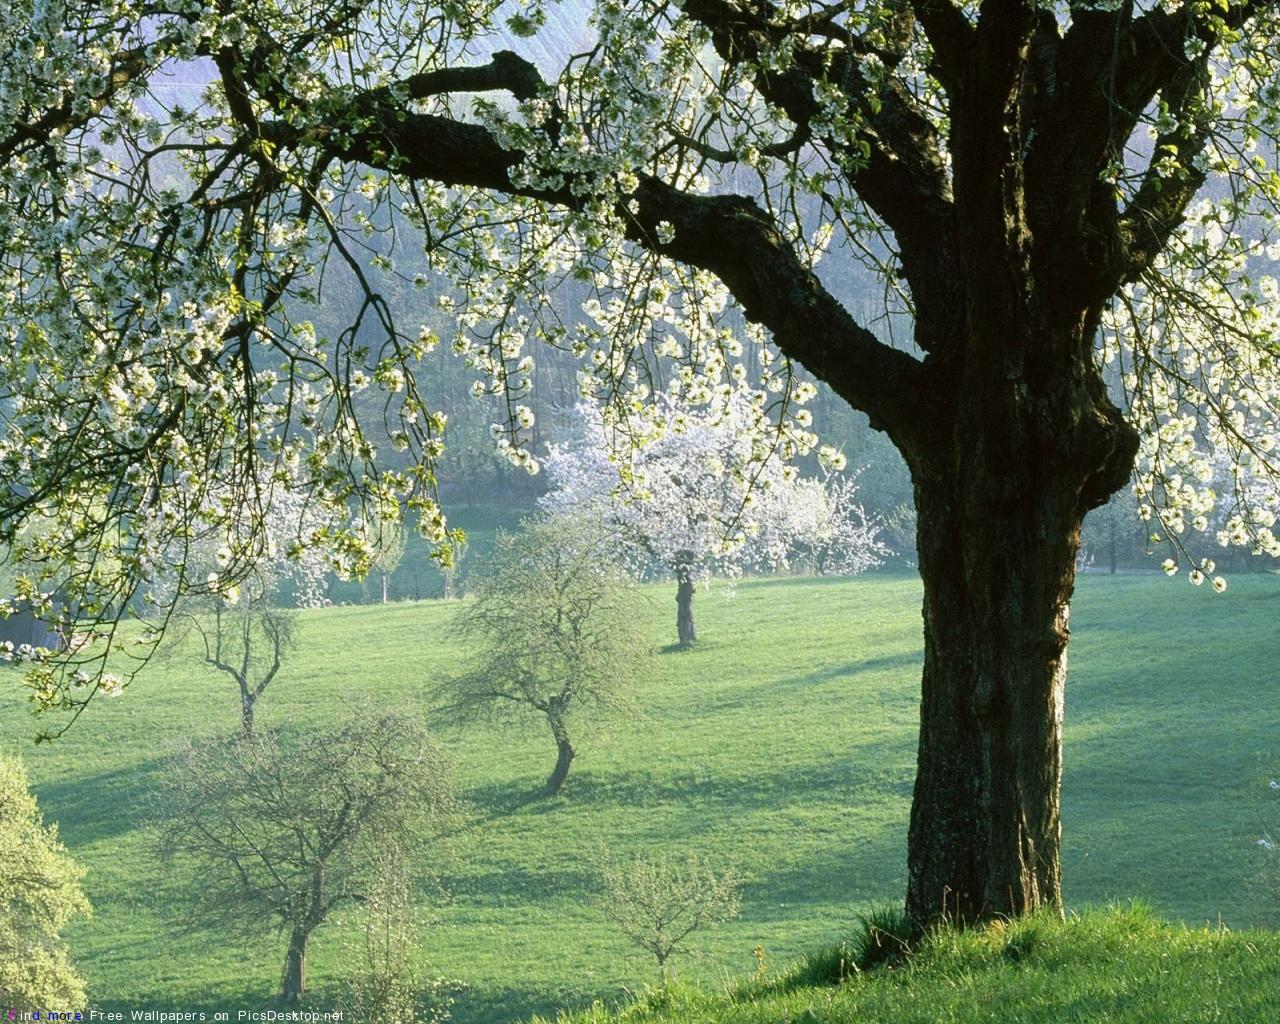 http://picsdesktop.net/Springtime/1280x1024/PicsDesktop.net_105.jpg